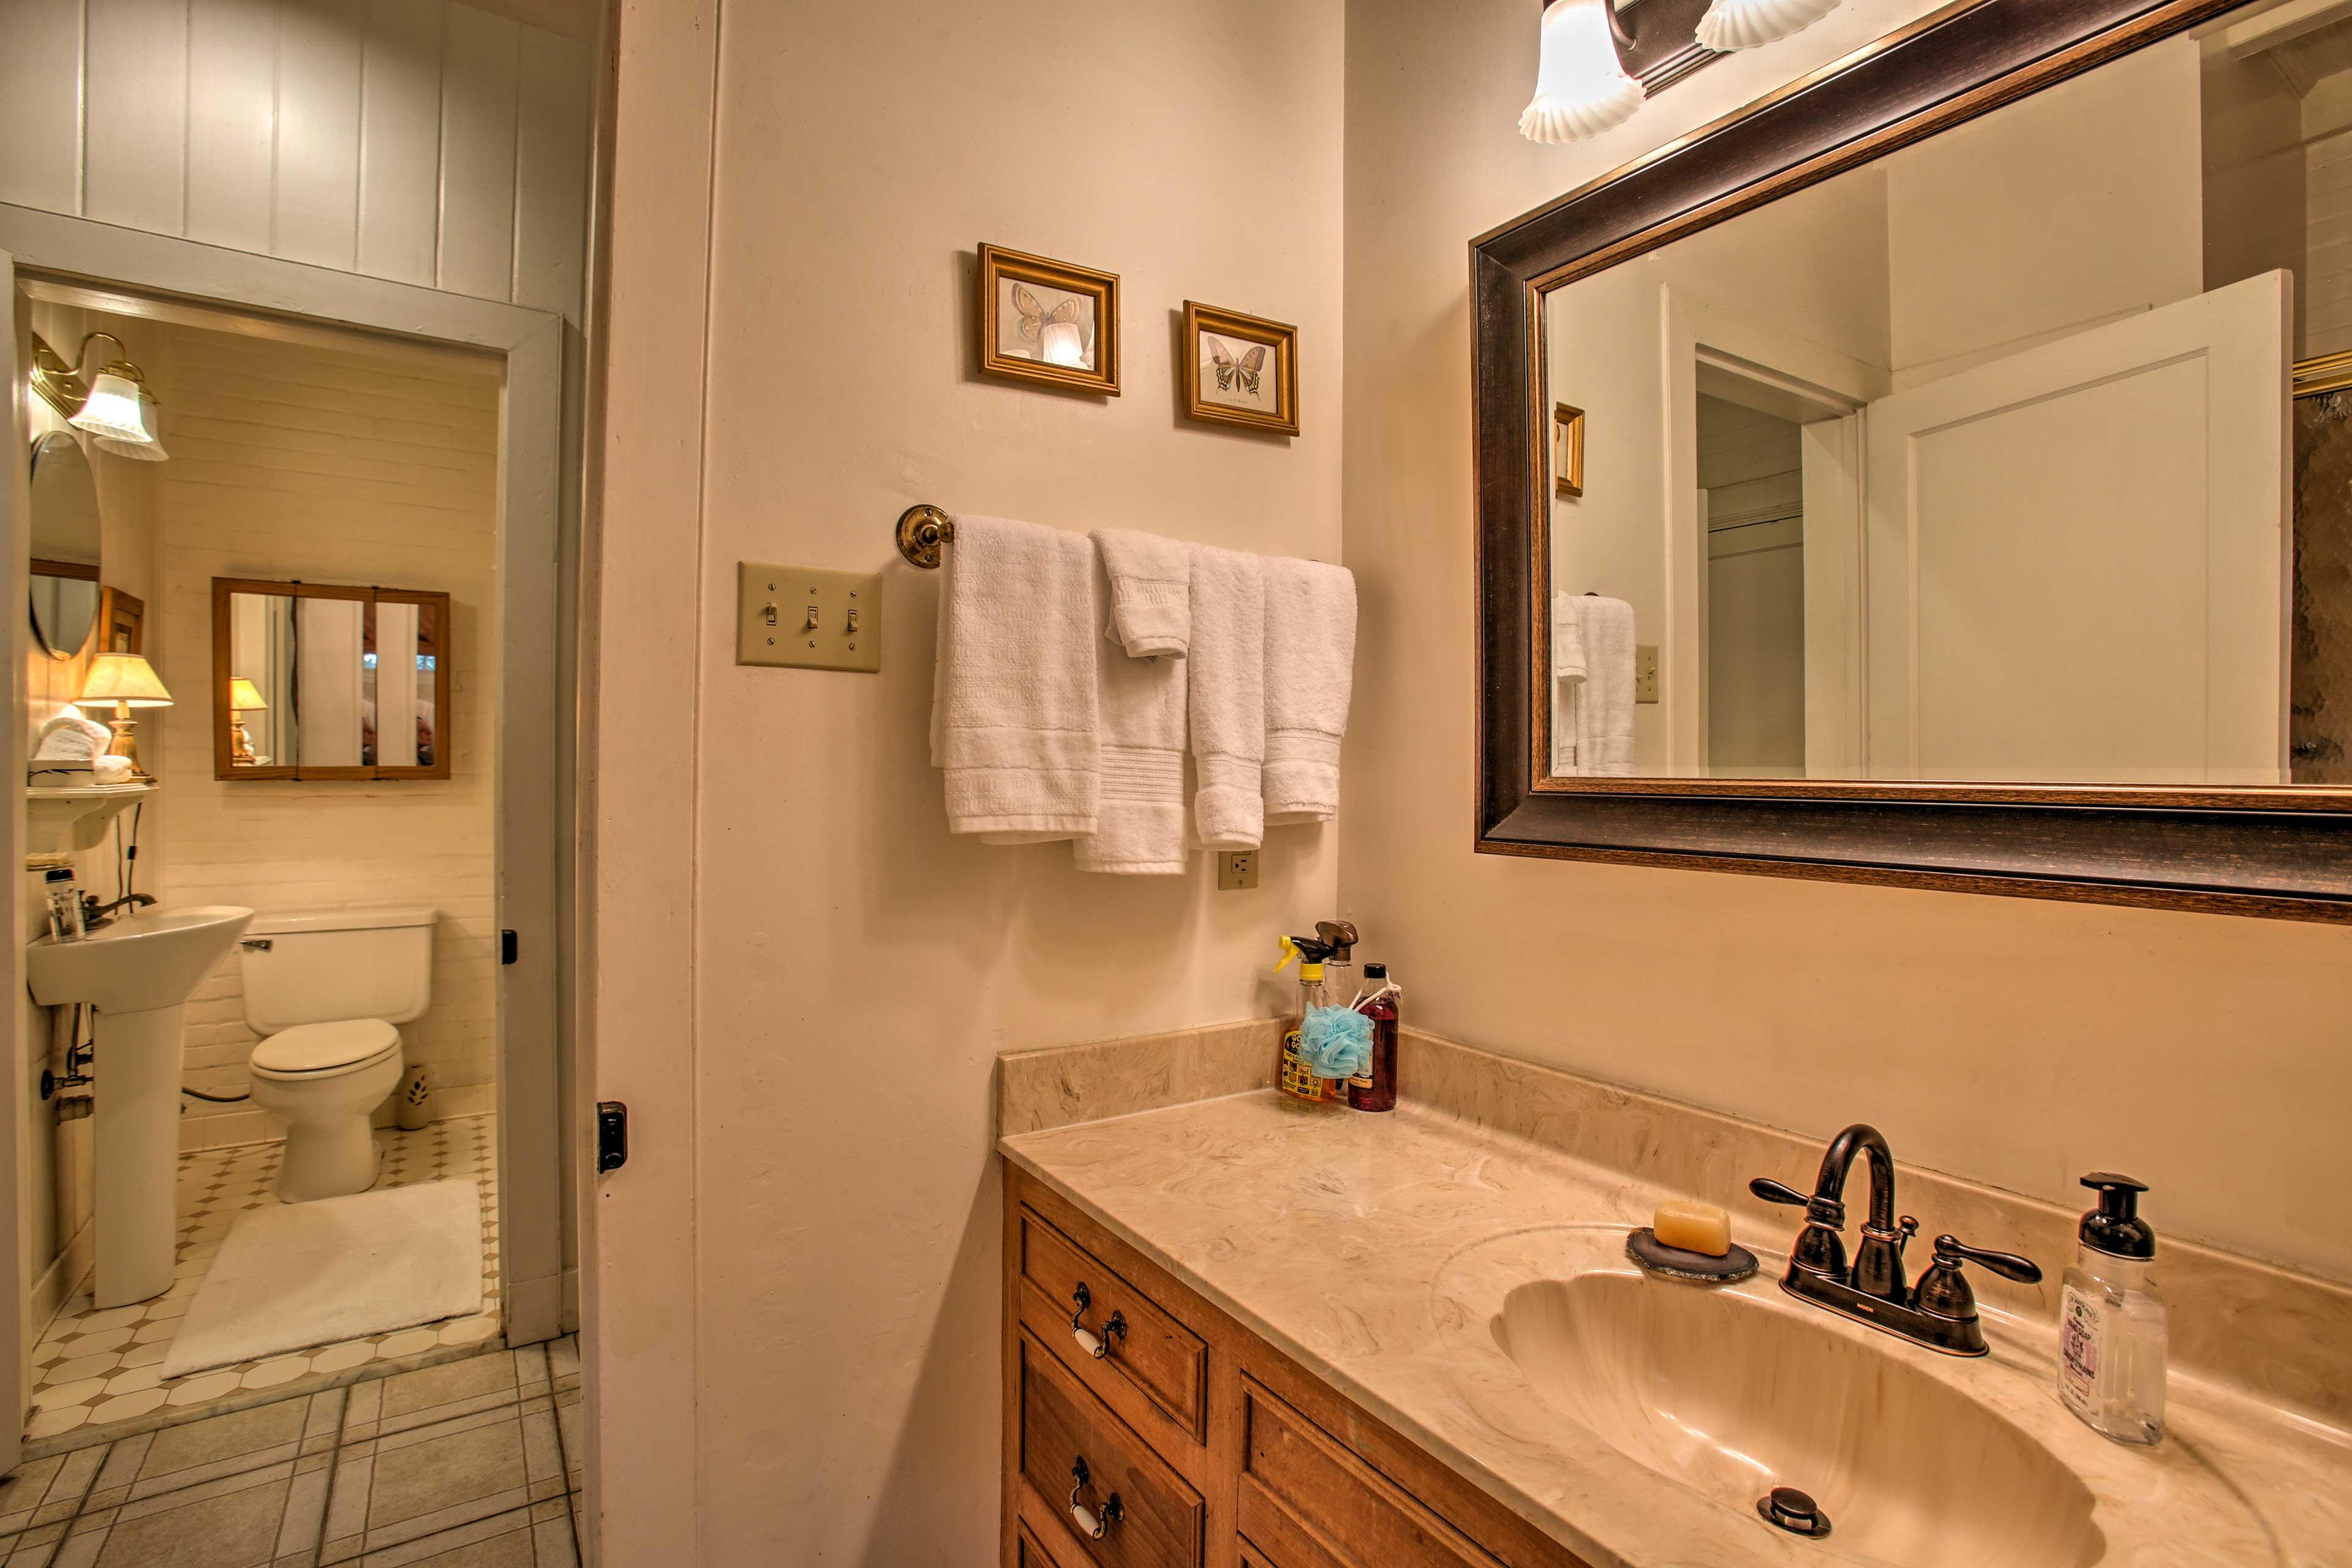 Starter set of bathroom supplies provided!